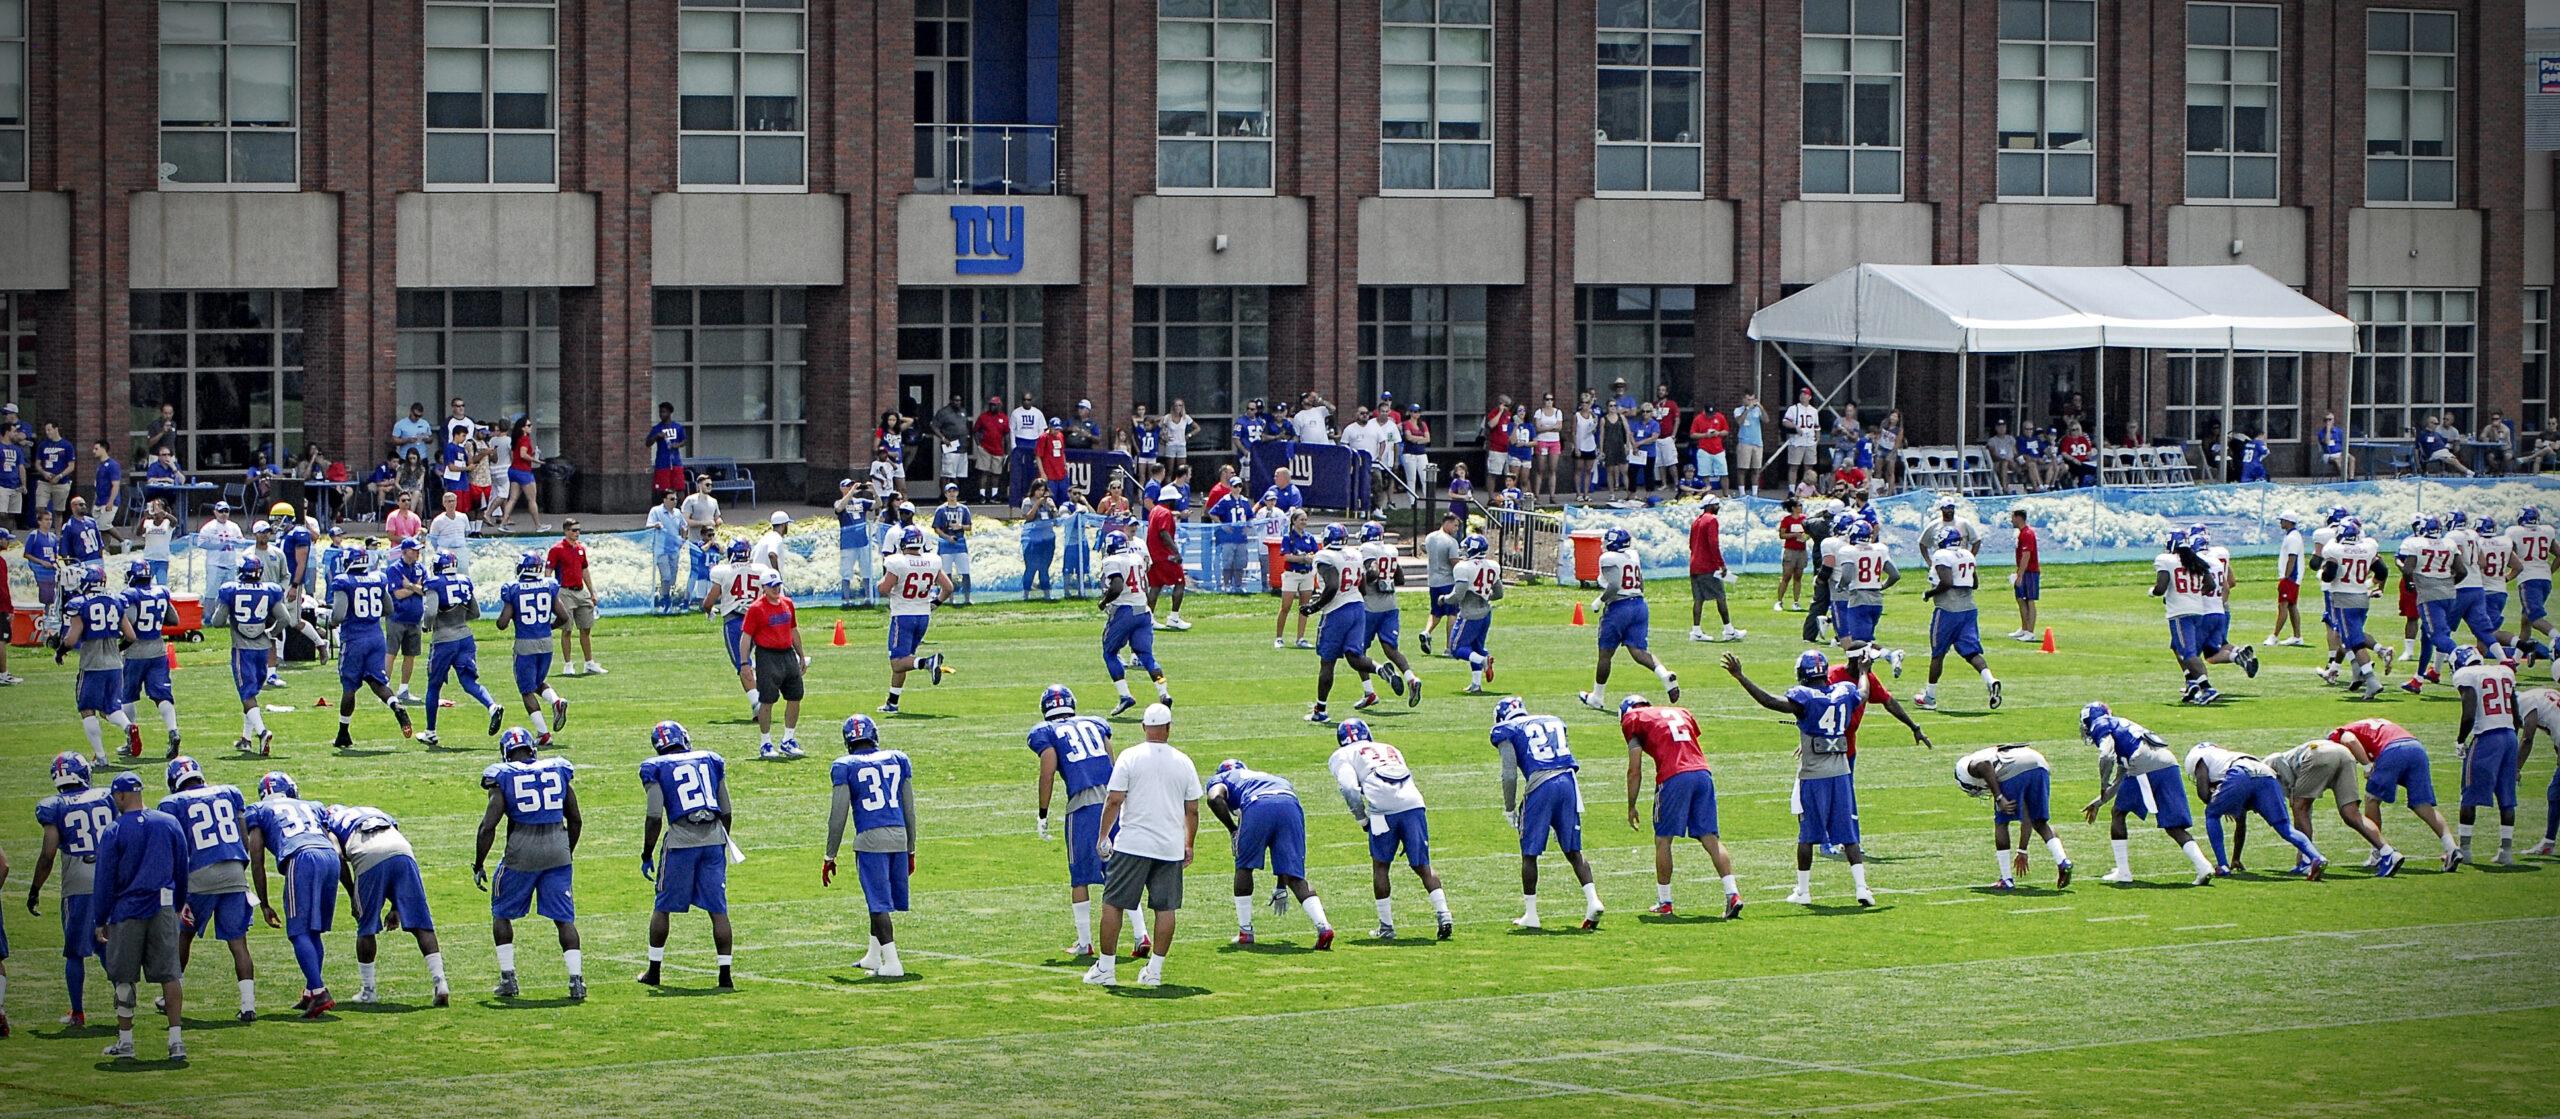 2015 New York Giants Training Camp